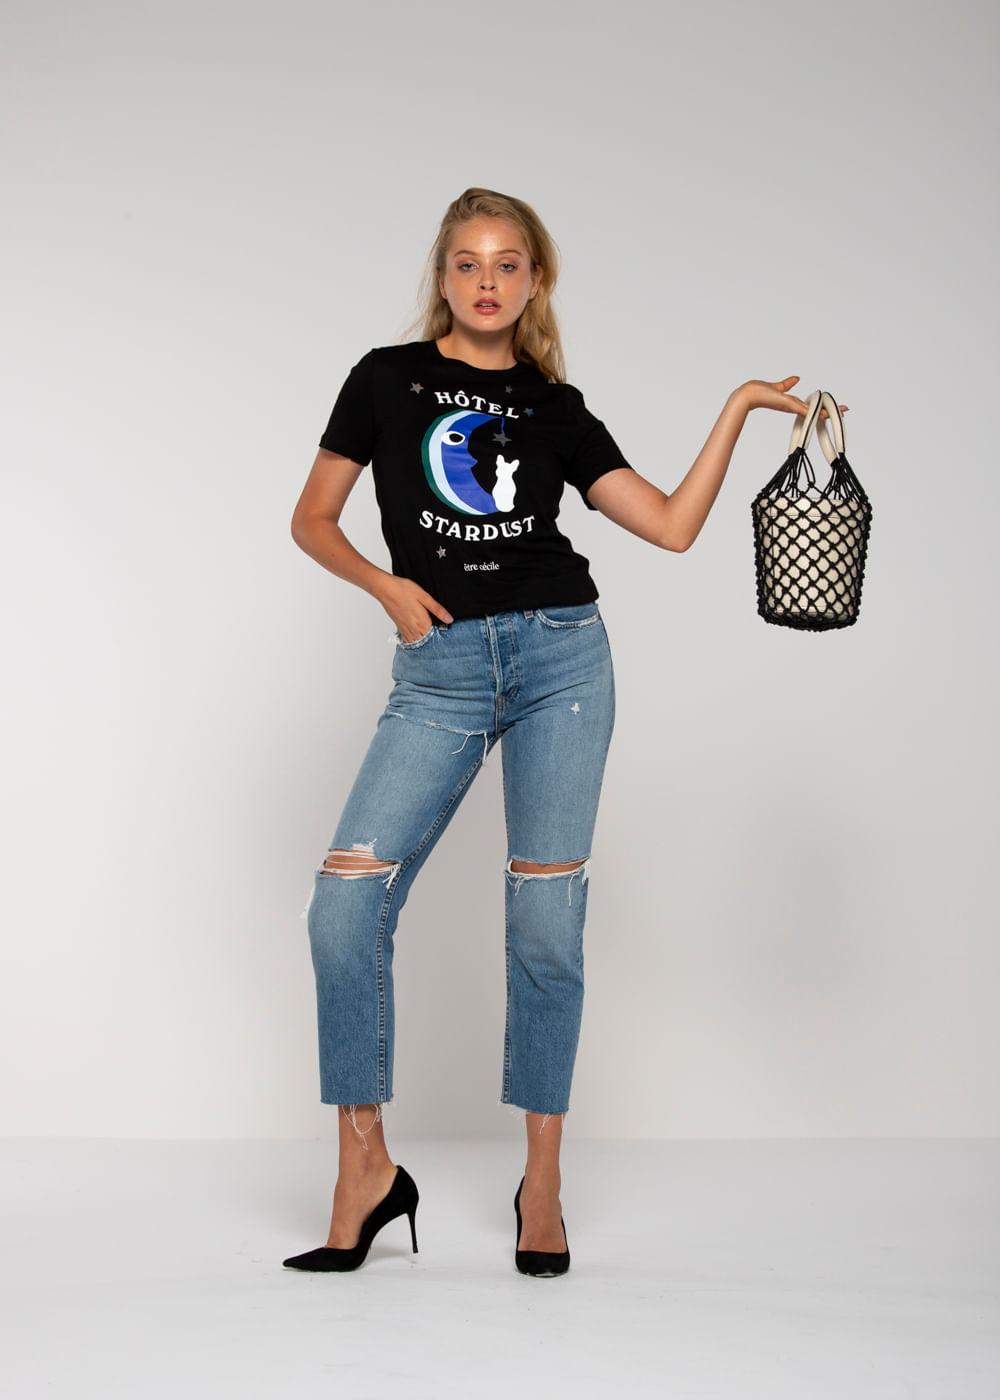 Camiseta Jersey Hotel Stardust Preta P